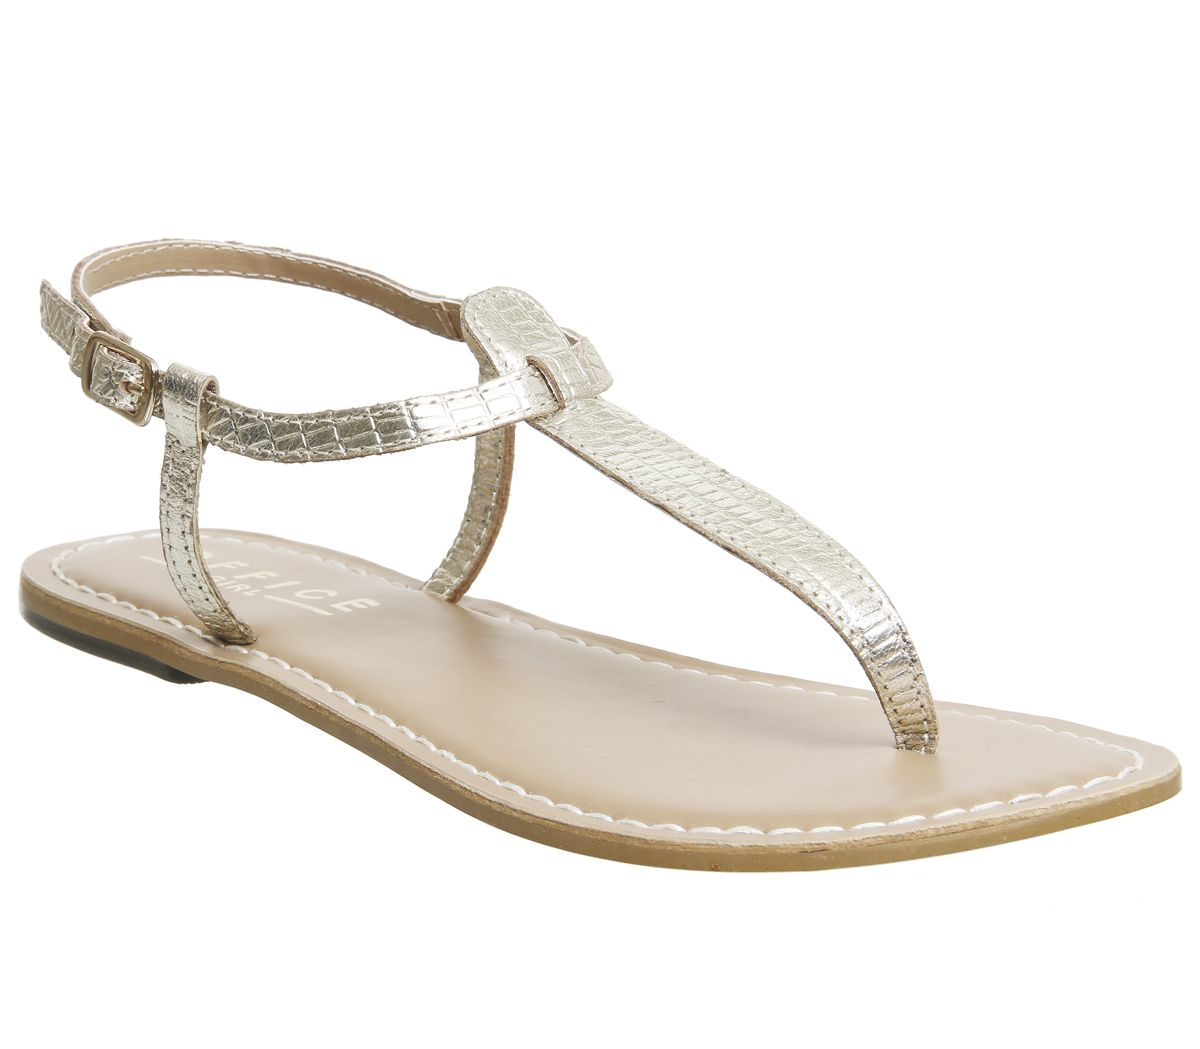 2a3e2981f554 Office Samba Toe Post Sandals Gold Croc Leather - Sandals